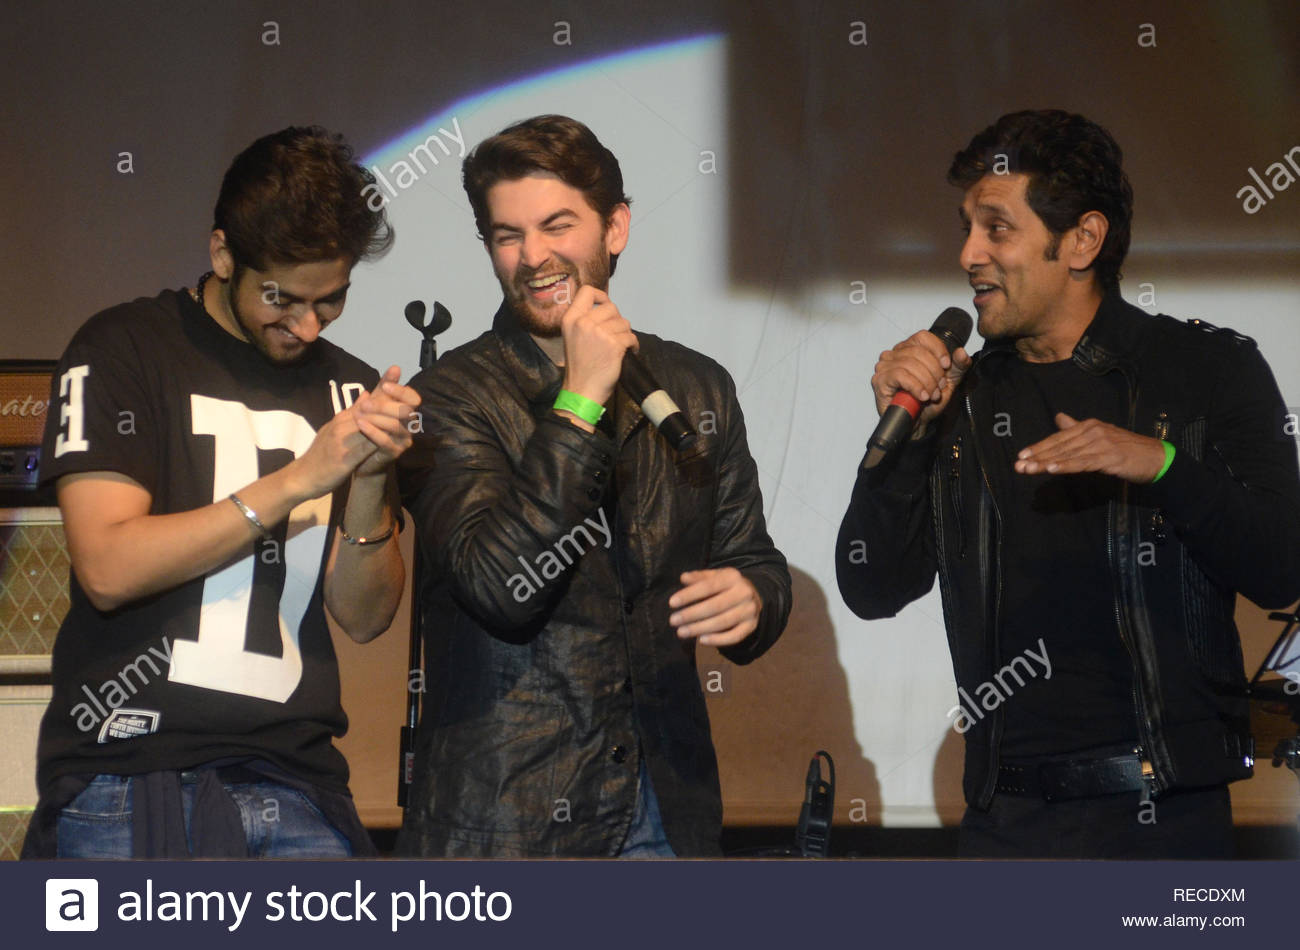 Bollywood actor Vinay Virmani, Neil Nitin Mukesh and  Vikram during the music launch of upcoming film David in Mumbai, India on January 14, 2013. (Shripad Naik/ SOLARIS IMAGES) - Stock Image